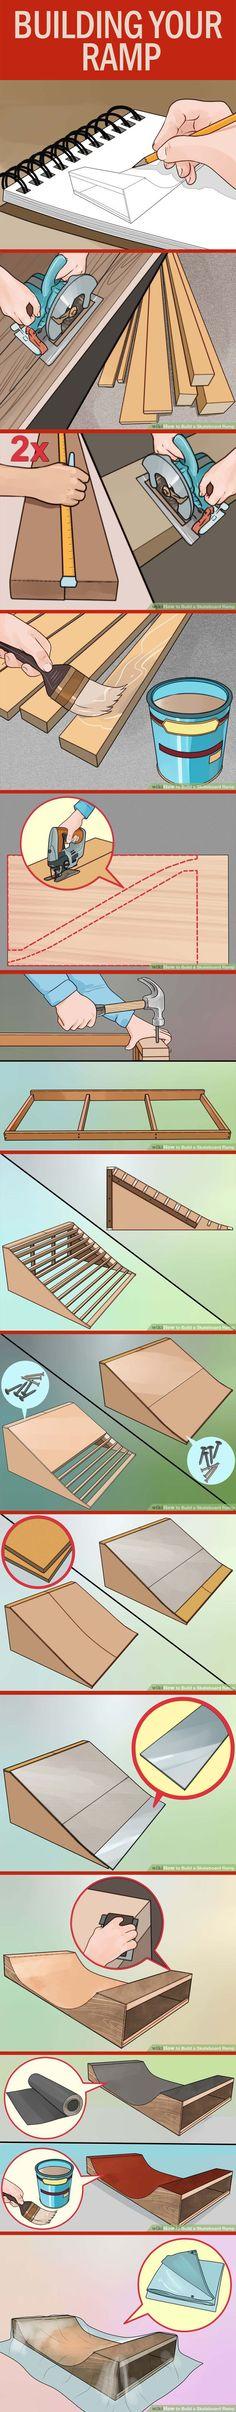 How to build a skateboard ramp DIY. Wikihow.com